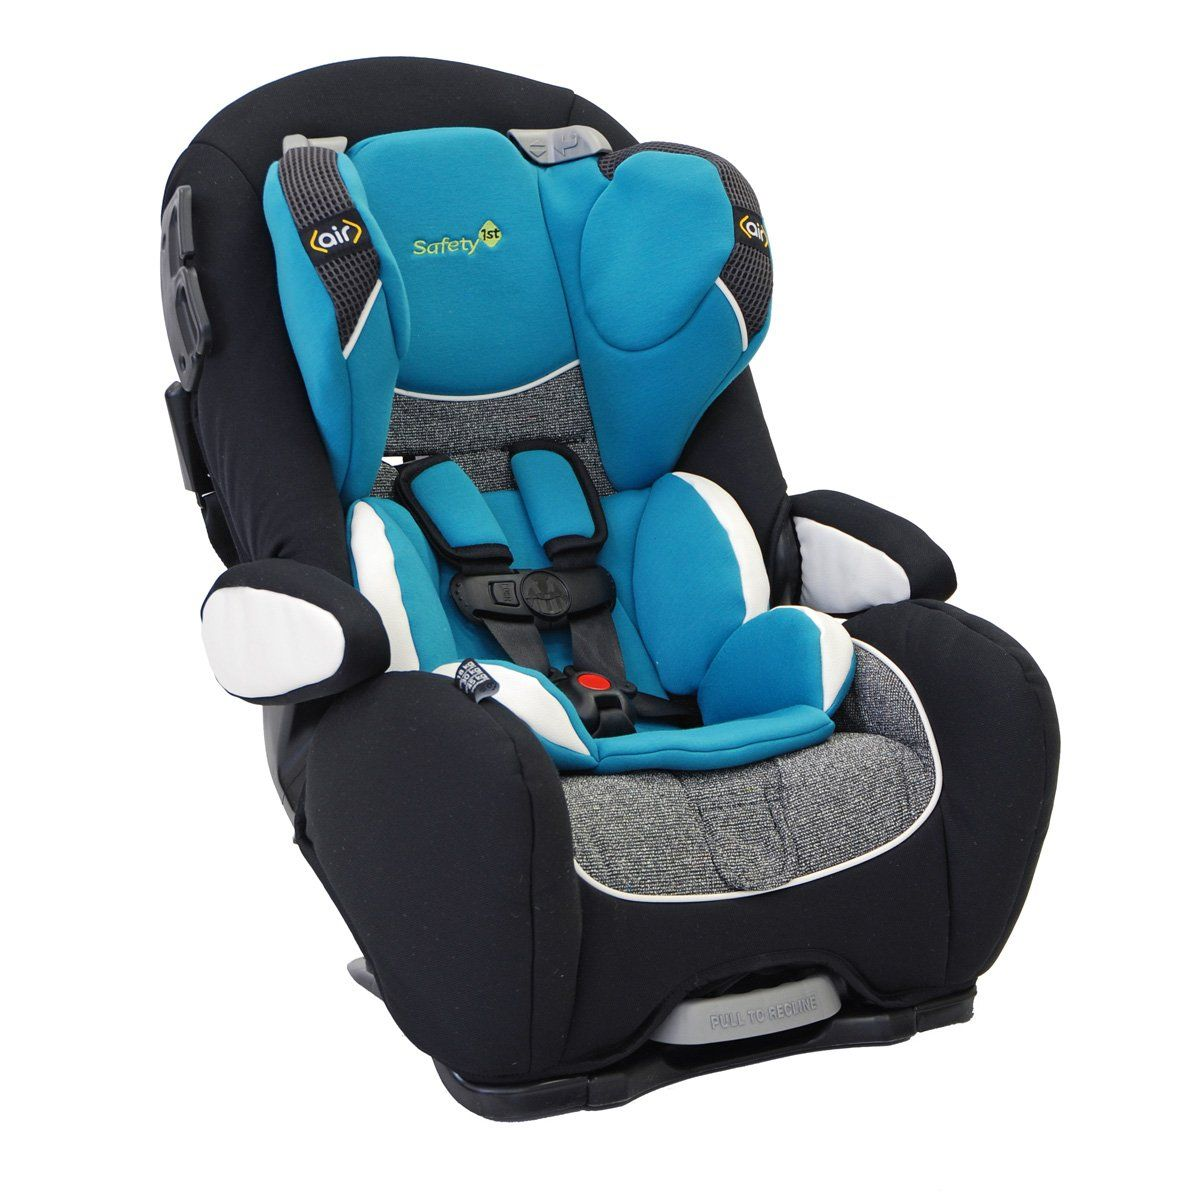 Safety 1st Alpha Omega Elite Air Akron Car seats, Baby